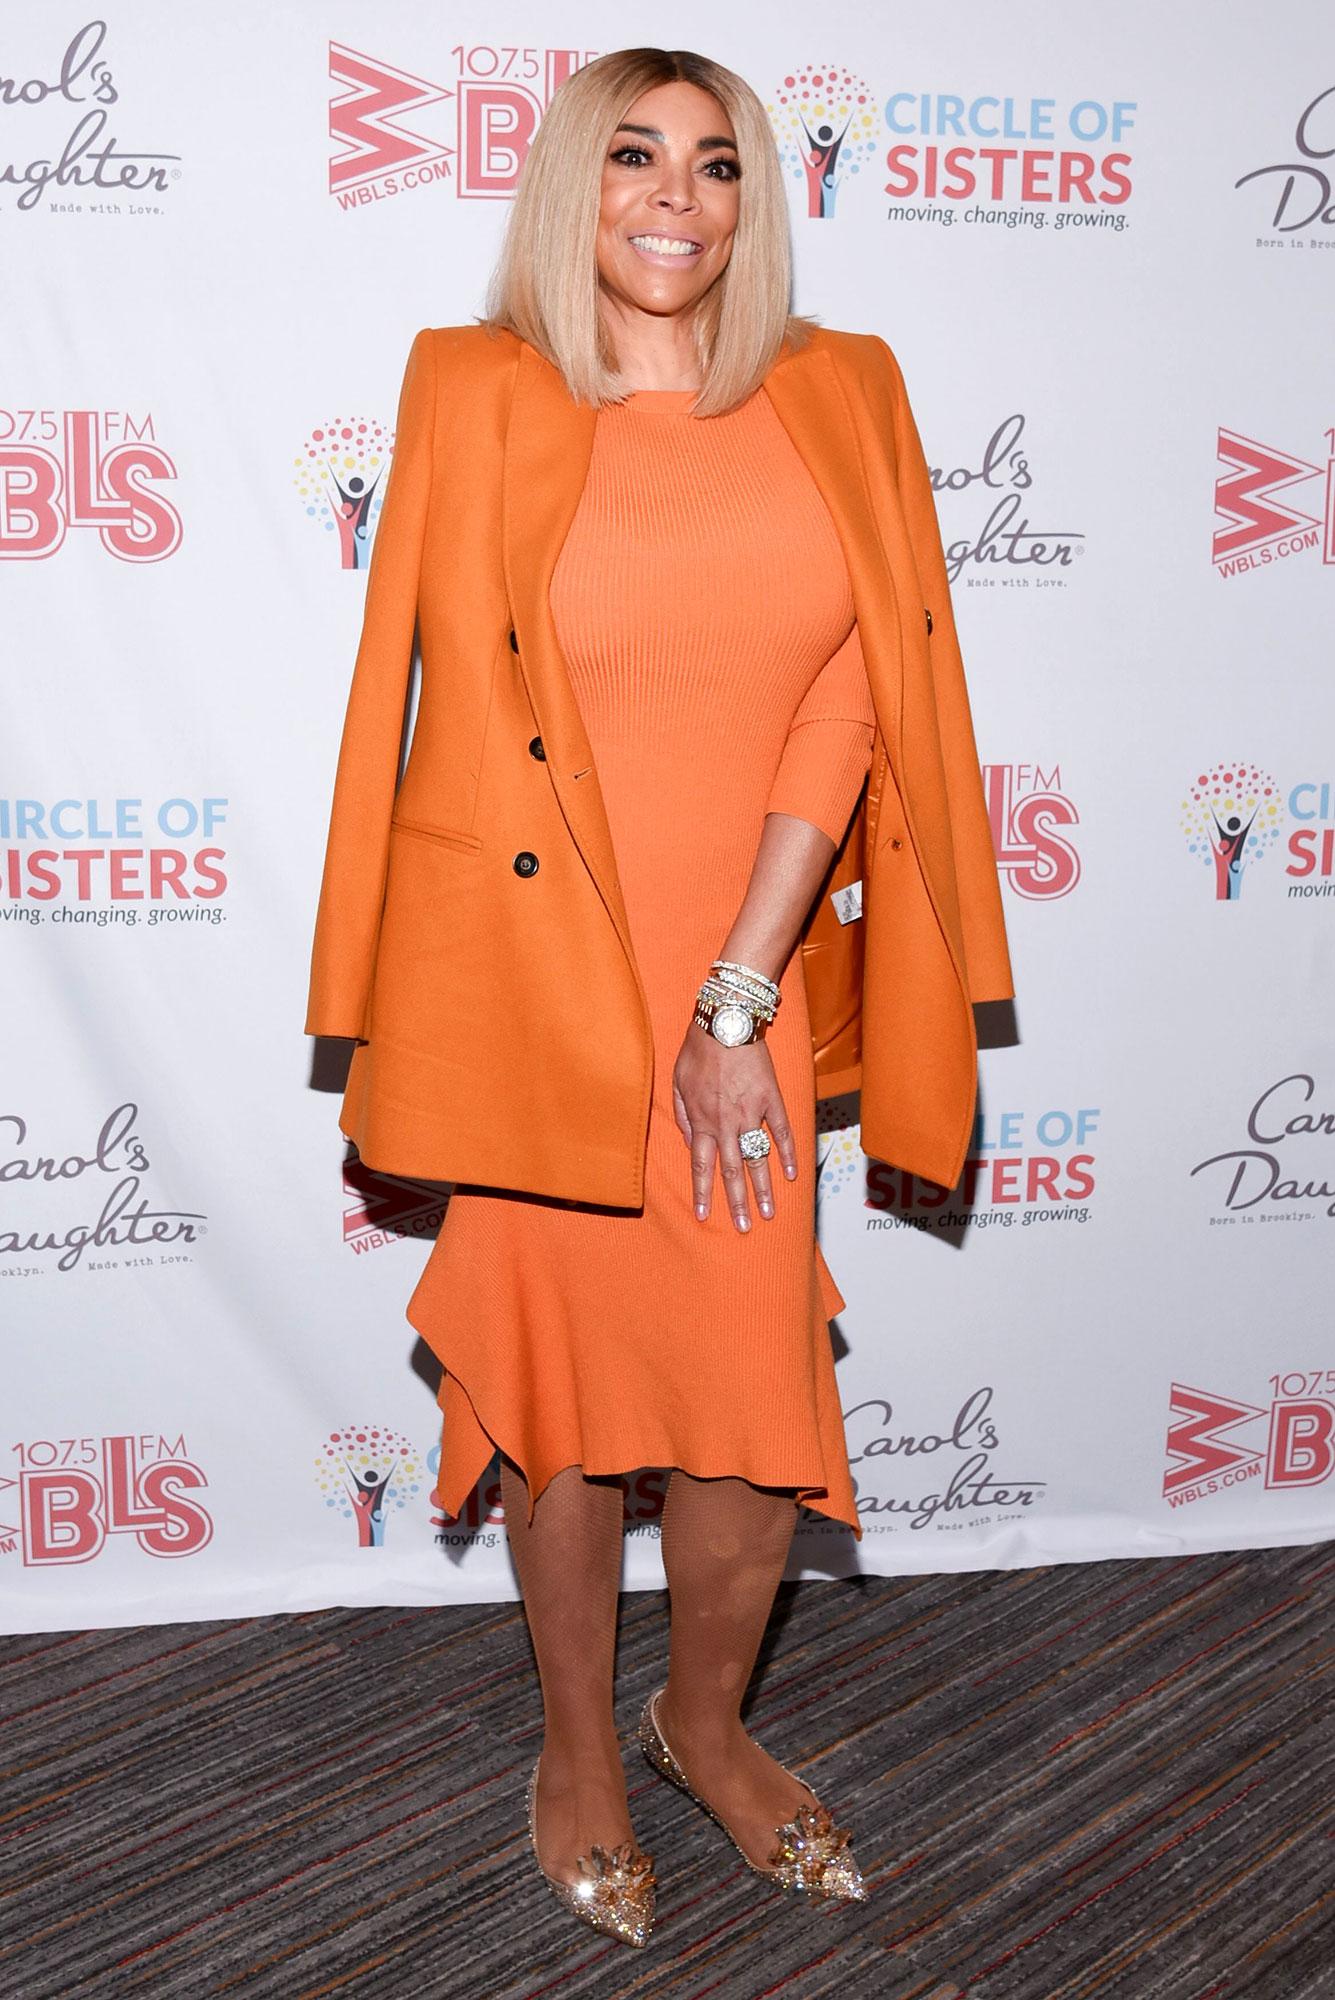 Wendy Williams Orange Dress Orange Jacket on WWHL Prenup